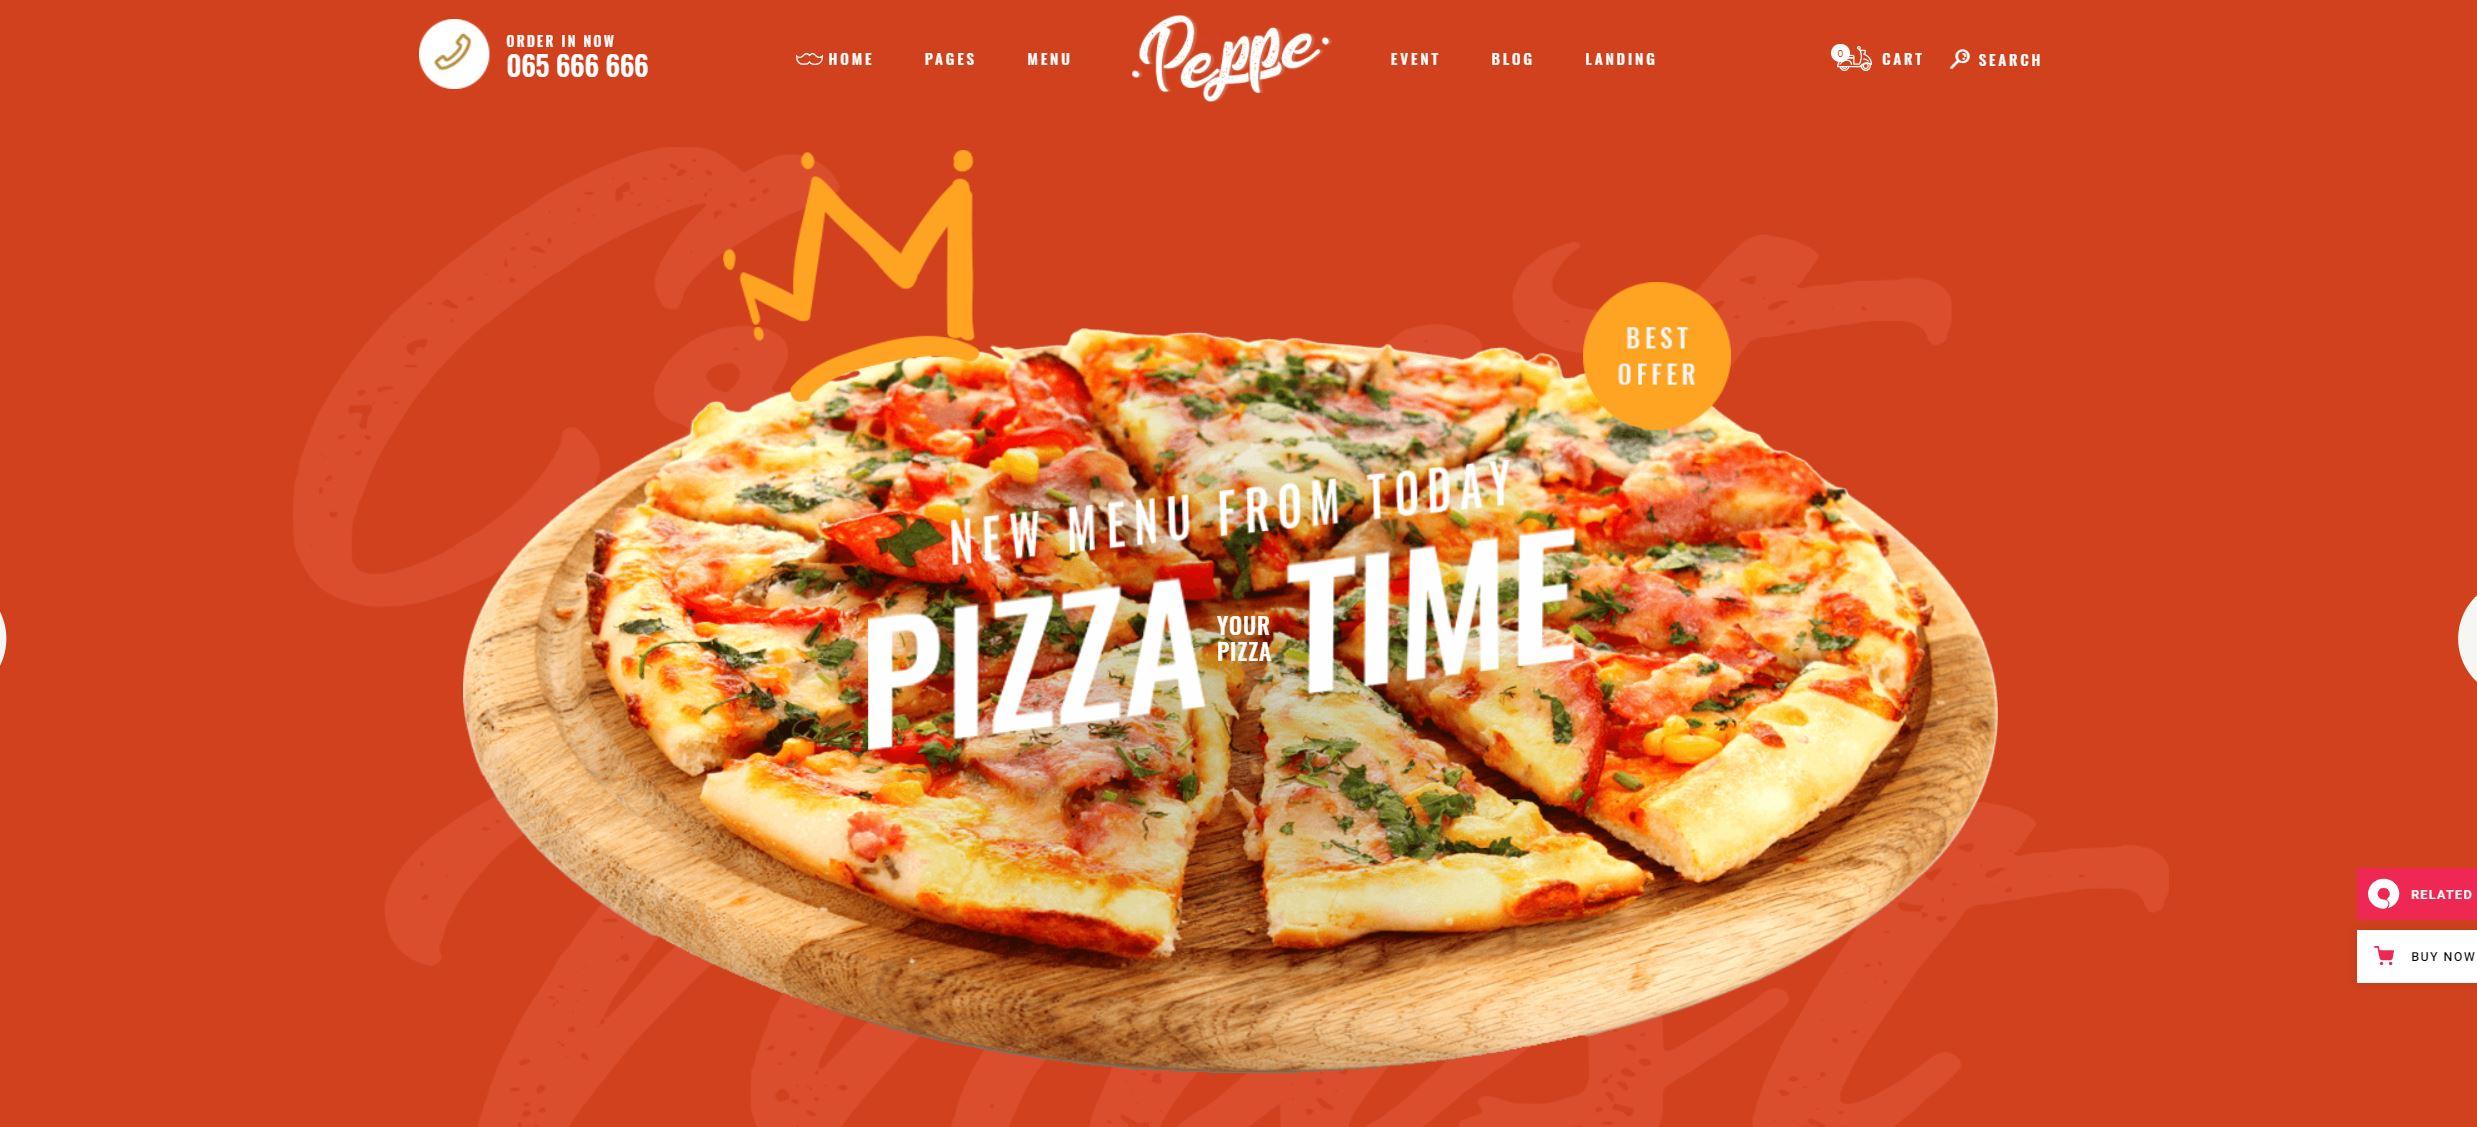 Don-peppe-wordpress-restaurant-theme